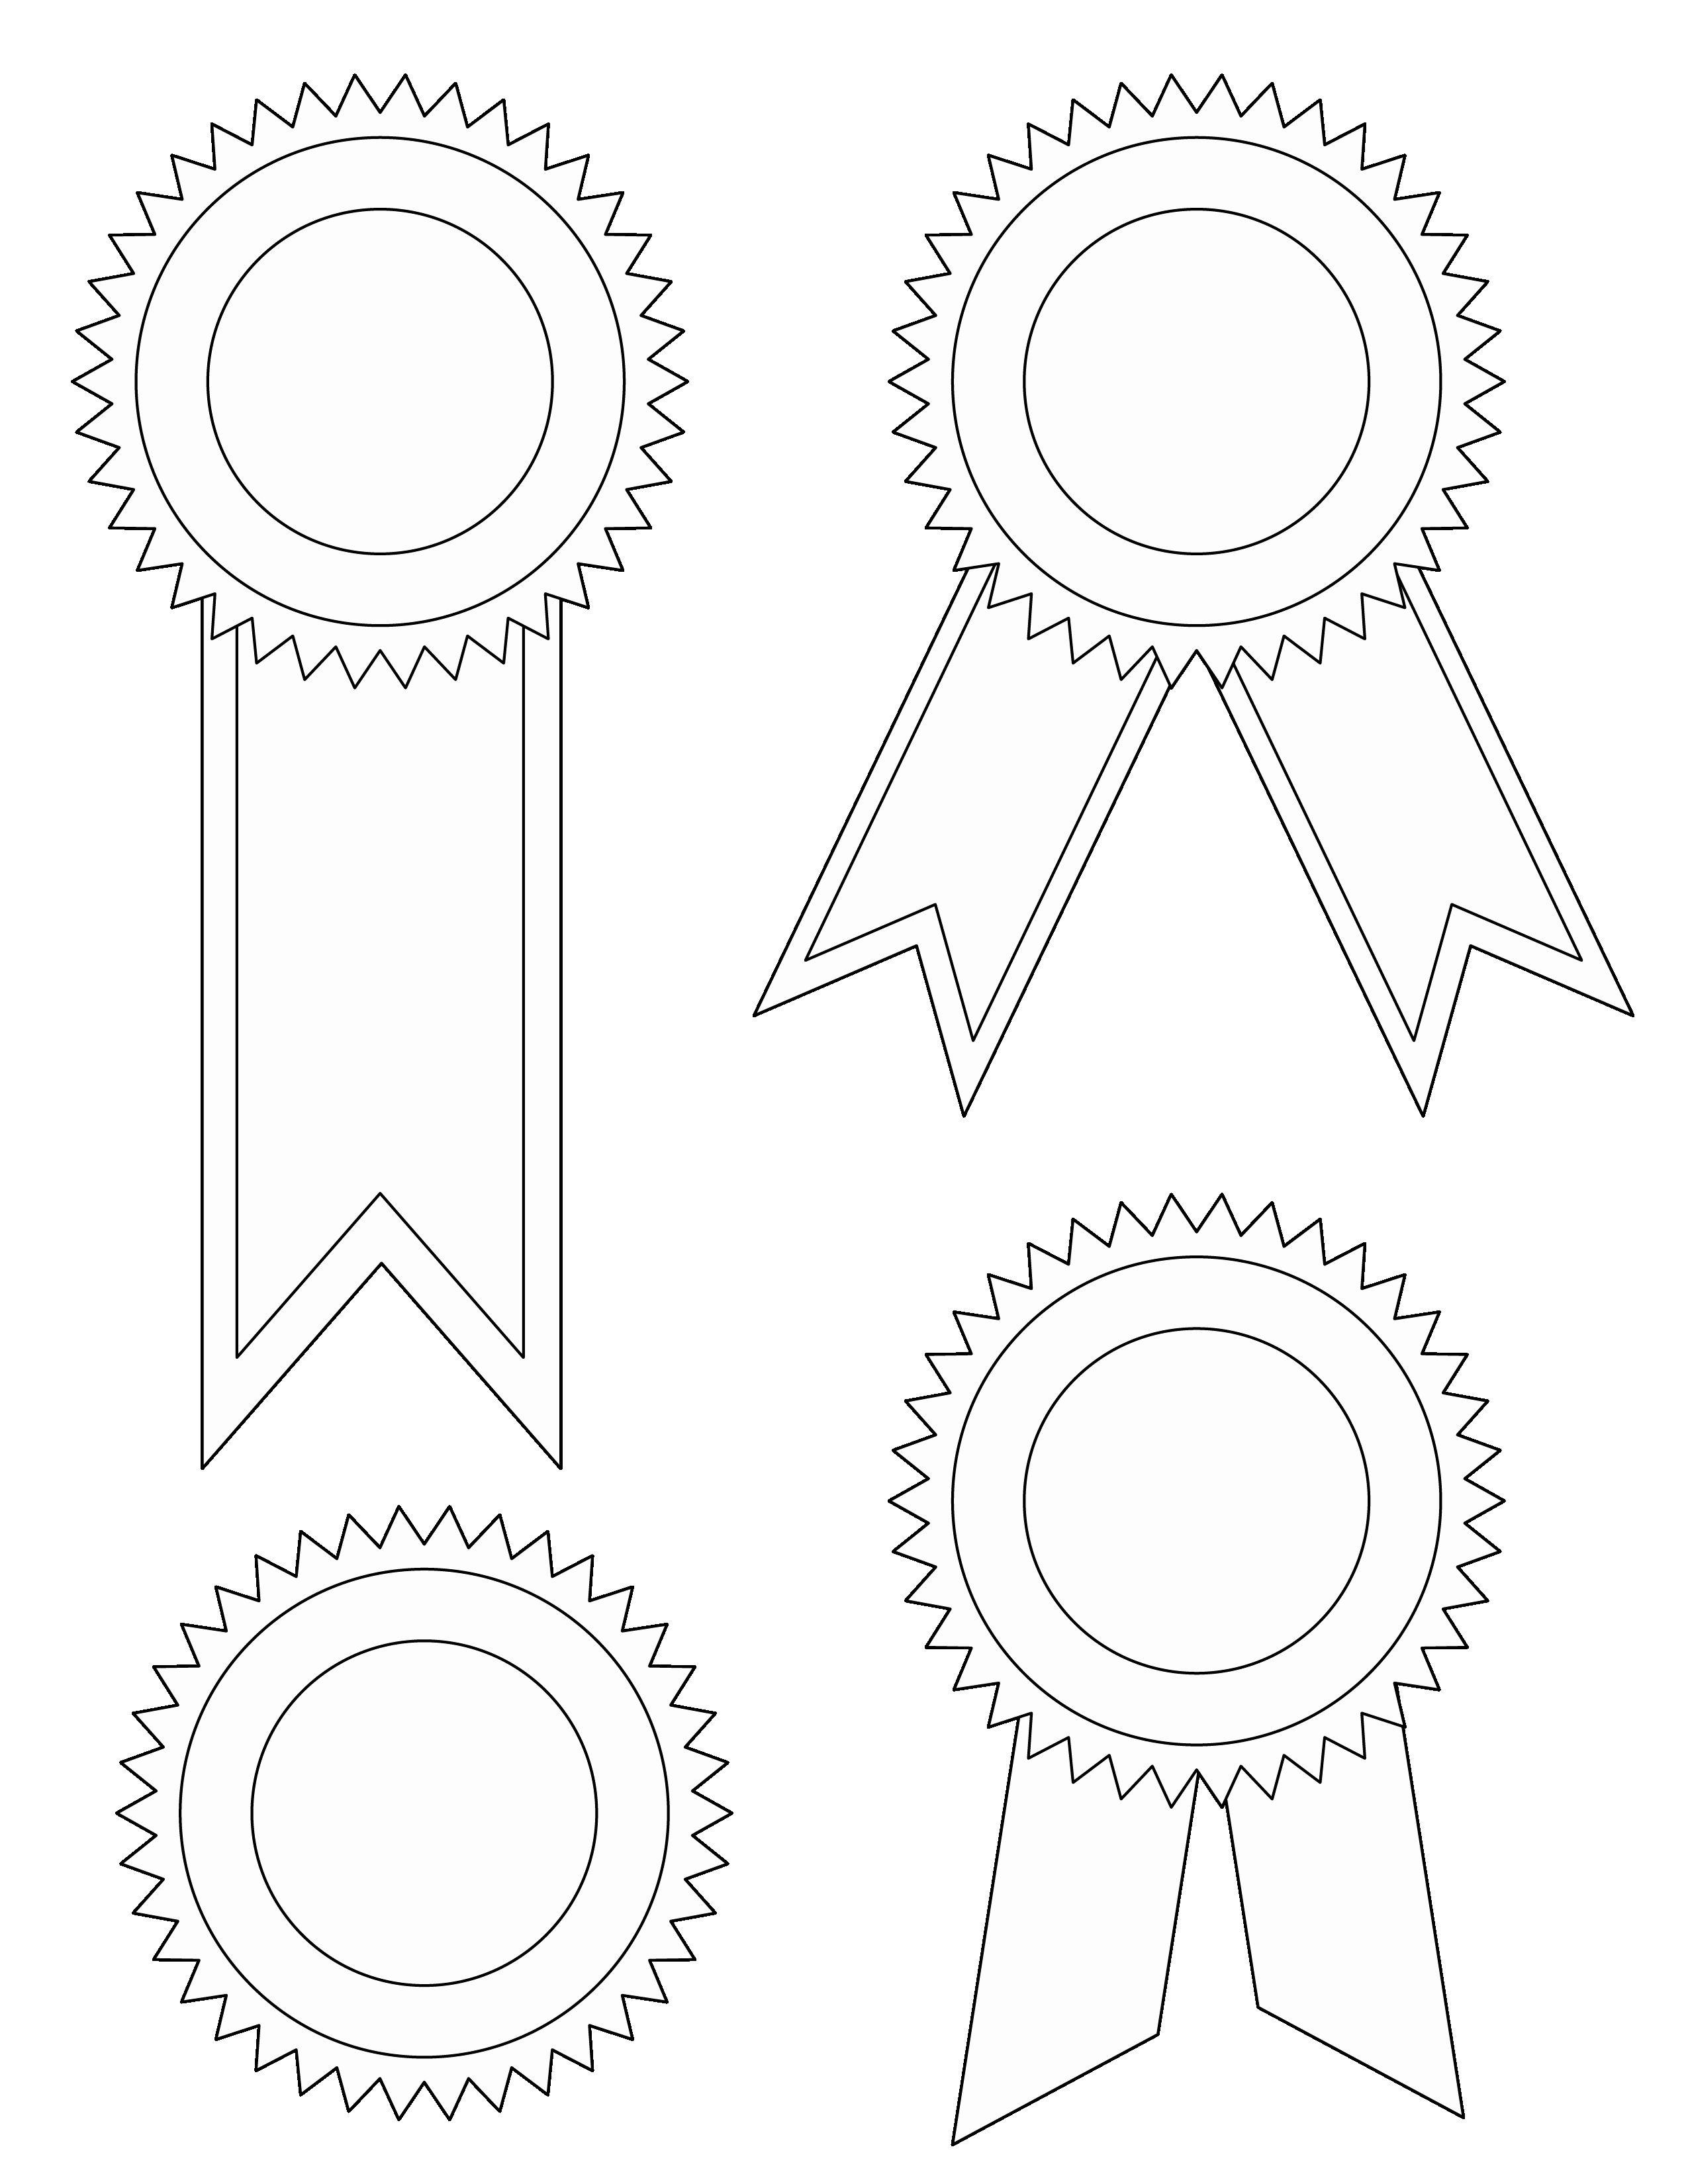 Free Printable Award Ribbons Fresh 8 Best Of Printable Prize Ribbons Award Ribbon Award Ribbons Award Ribbon Award Template